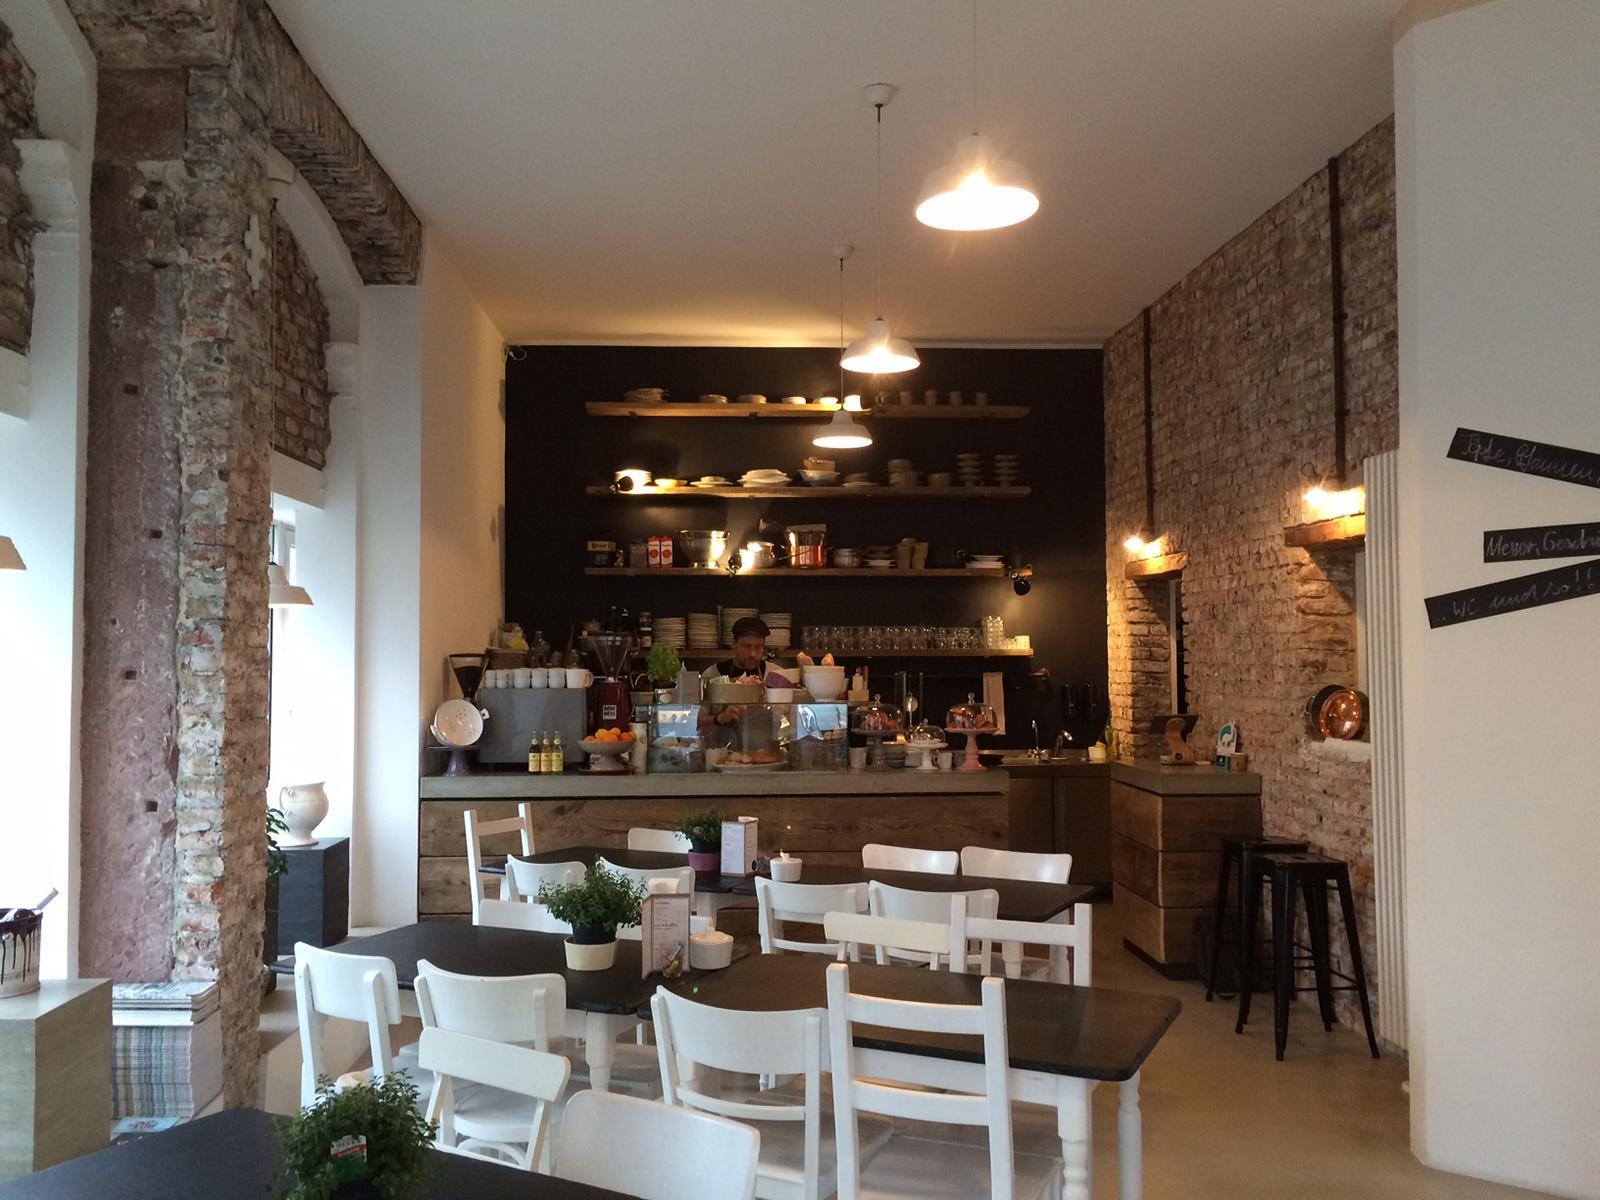 Eccolo – Sandros Kochladen und so, Oeder Weg, 60322 Frankfurt am Main